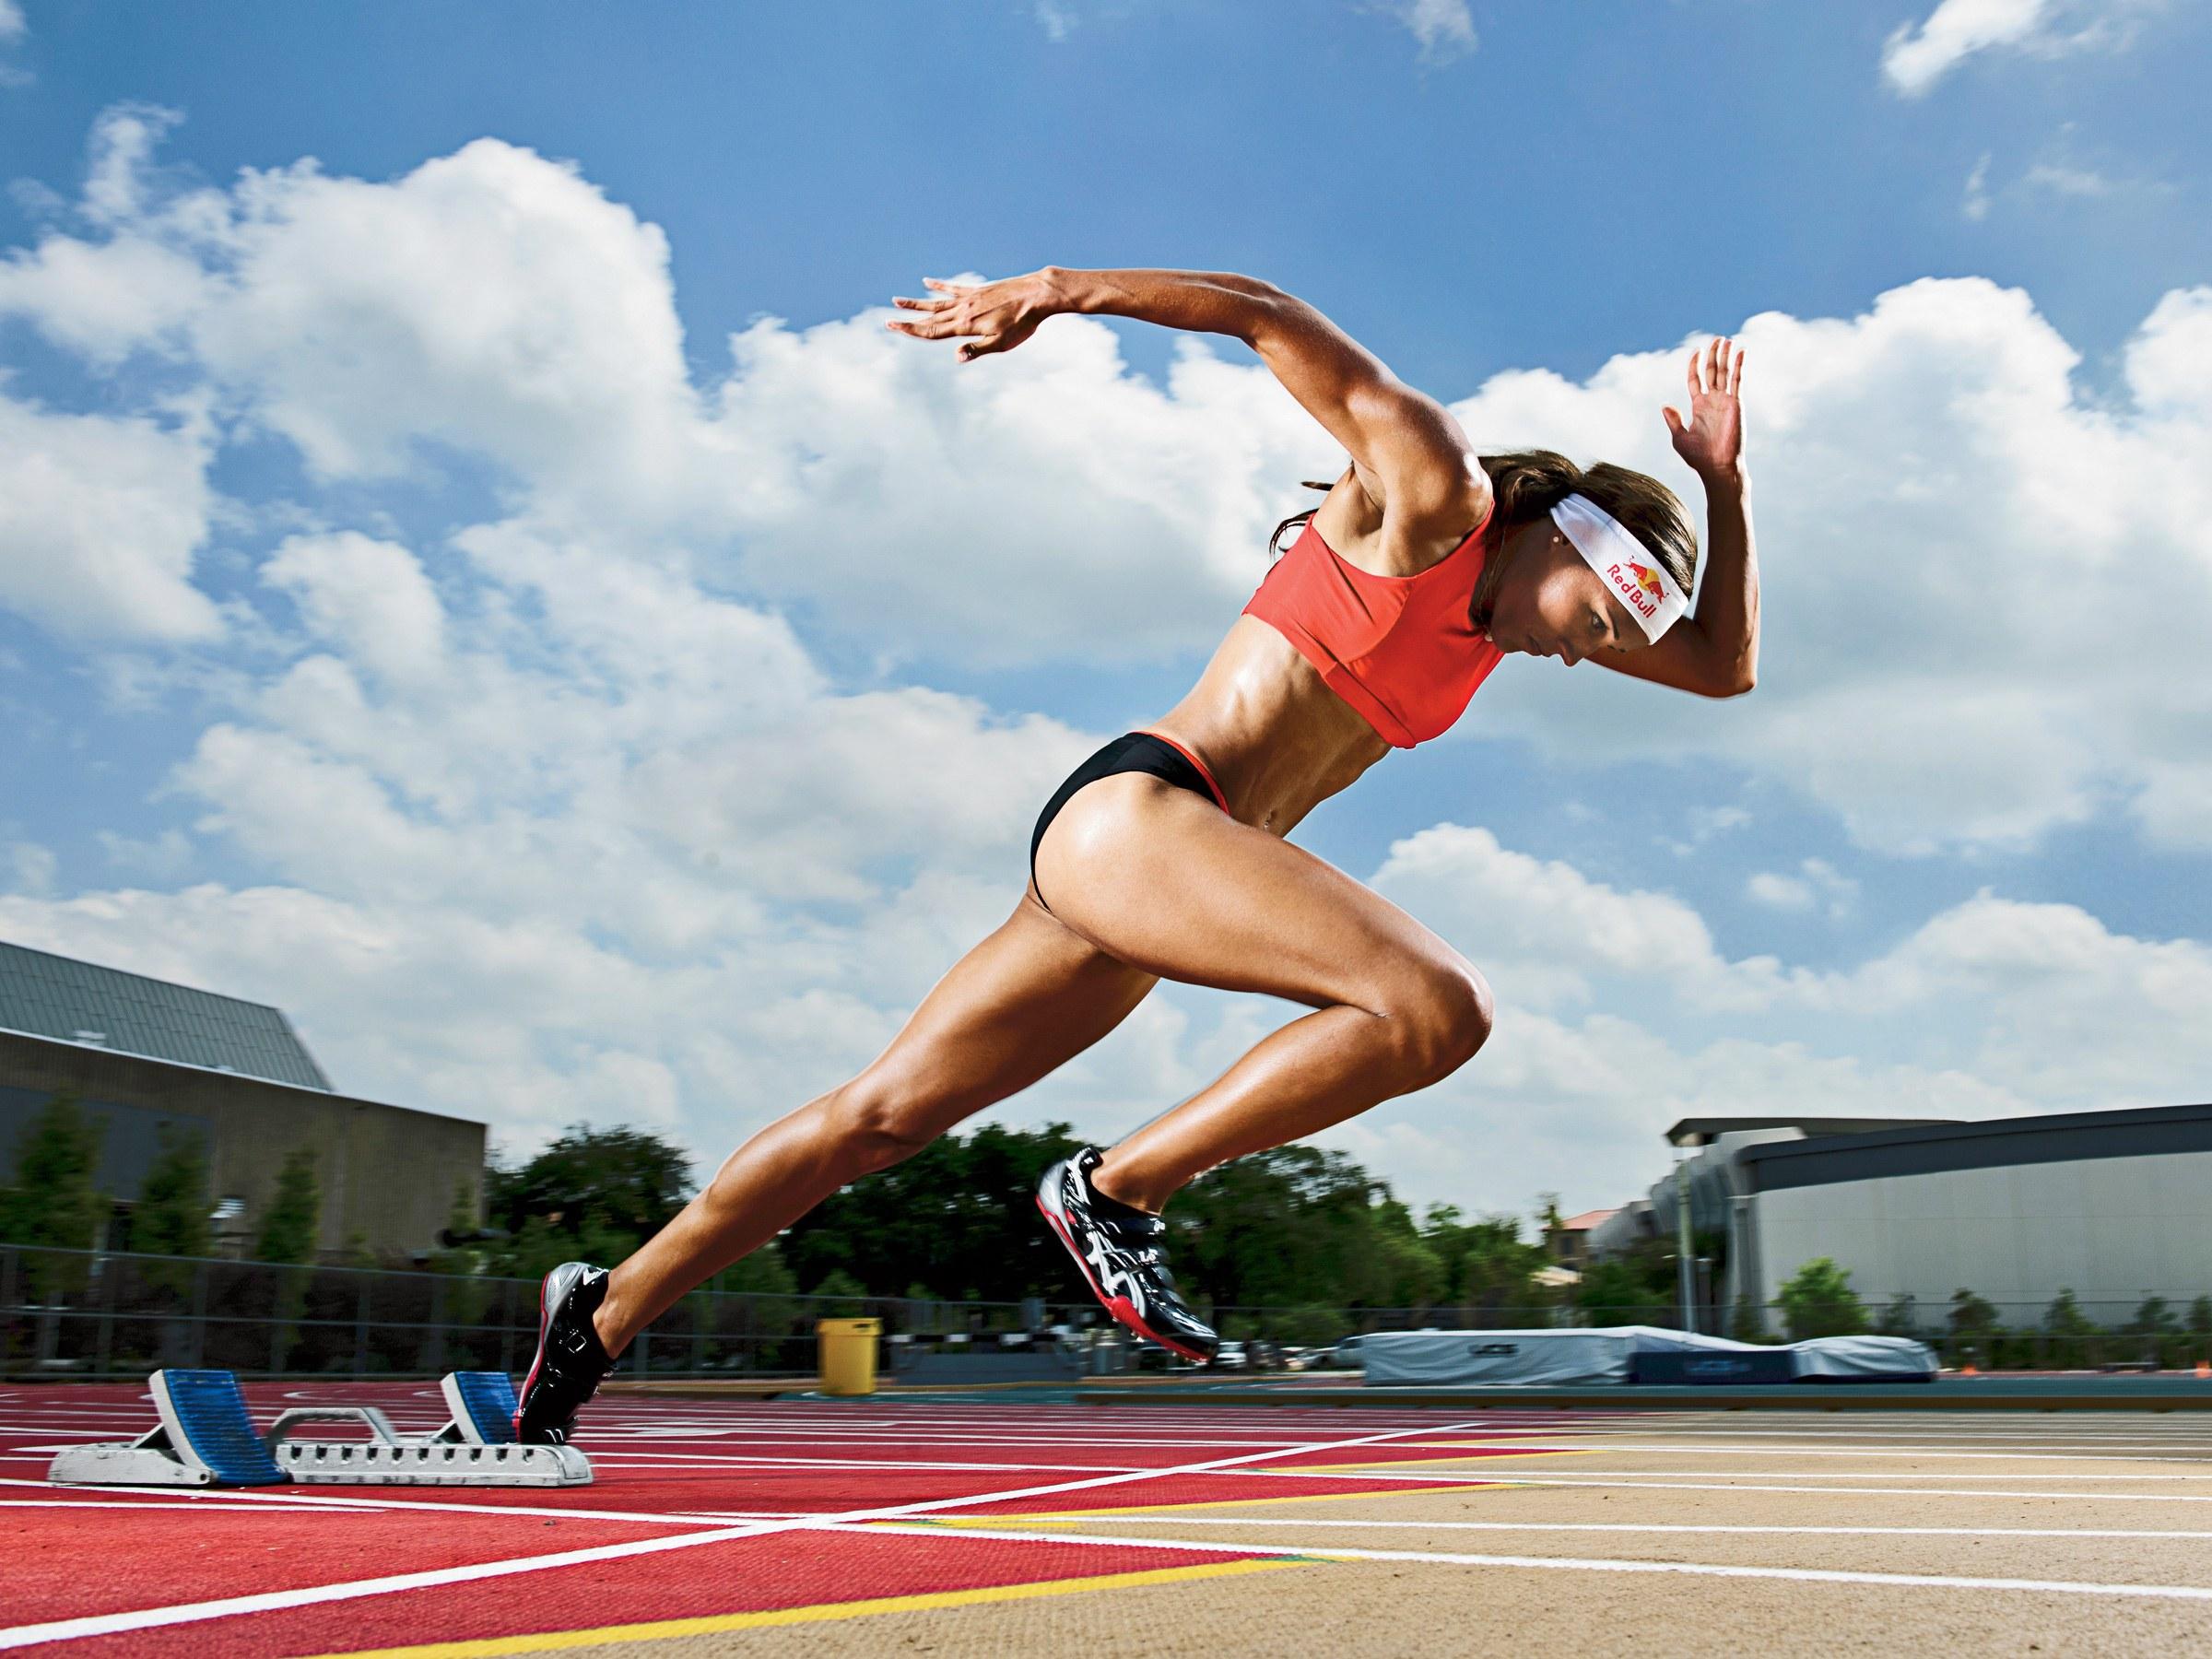 pro athlete